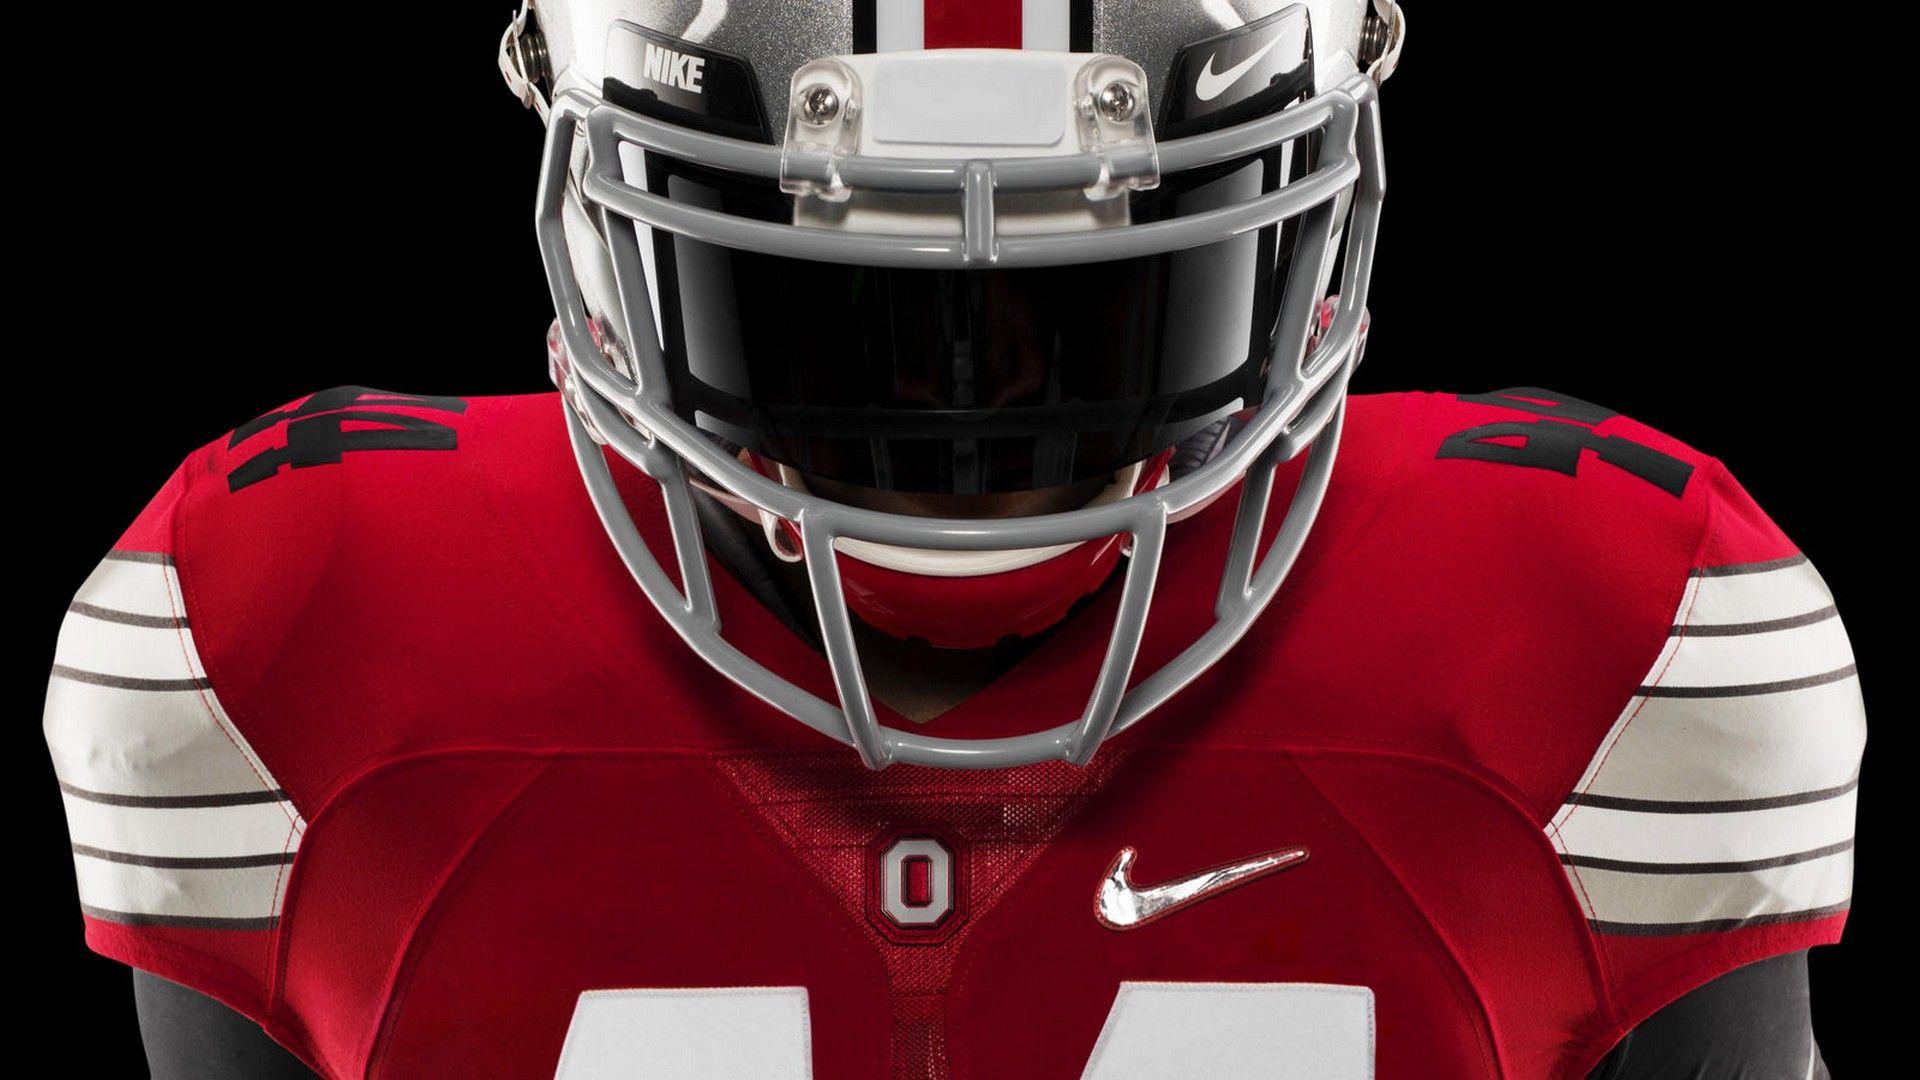 Live Wallpaper Hd Ohio State Uniforms Ohio State Football Helmets